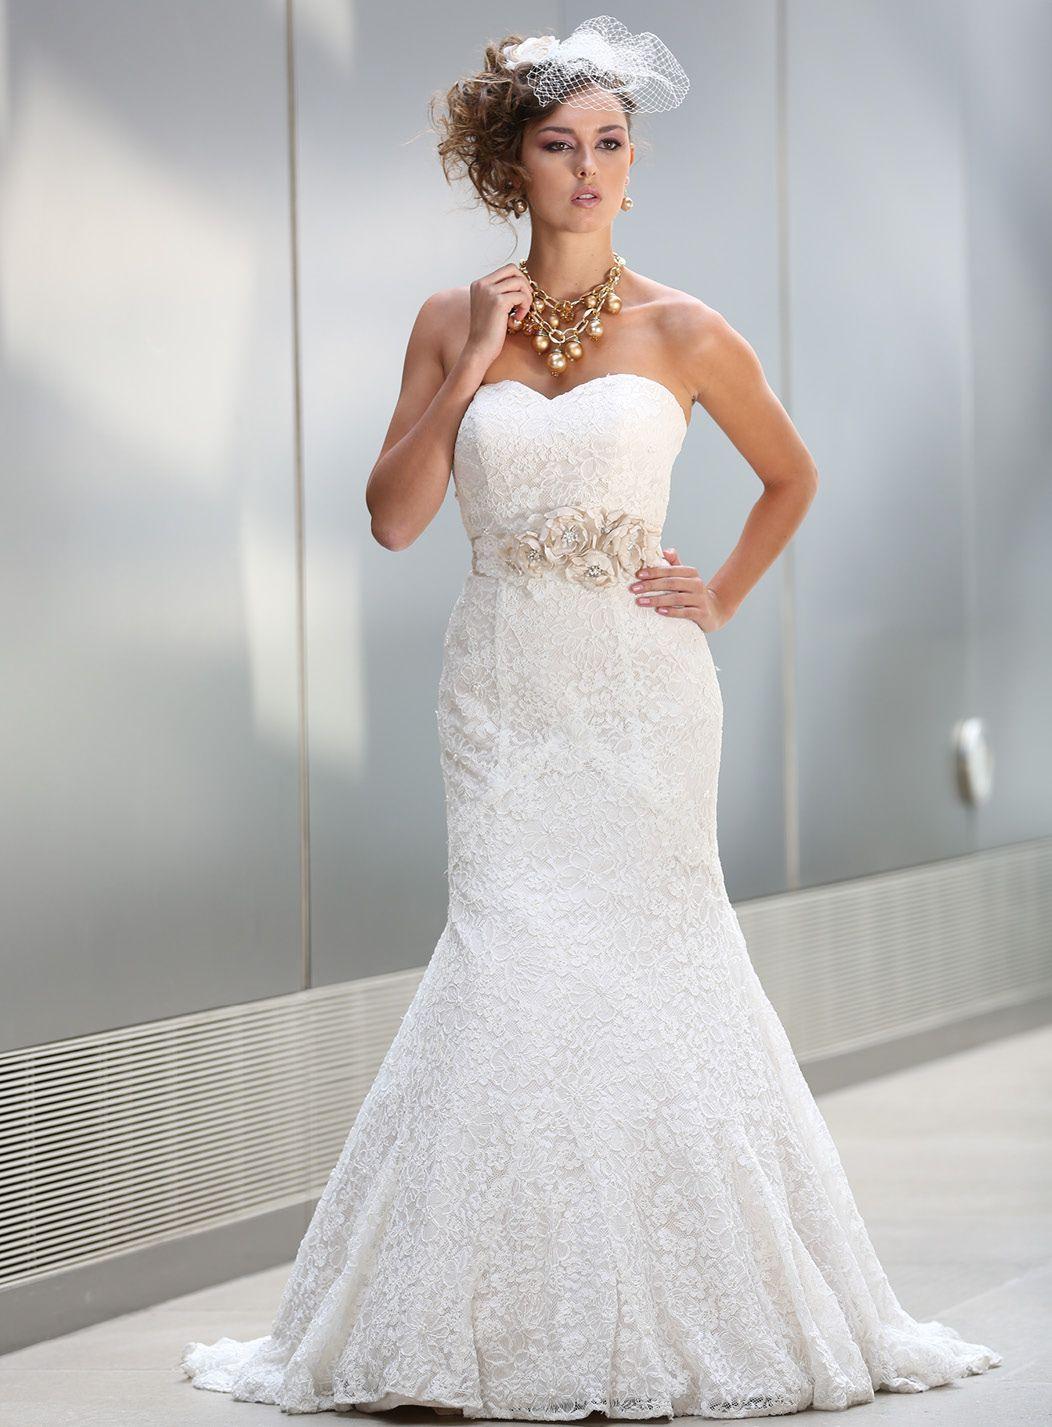 Divine Wedding Dresses Atlanta Wedding Dresses Designer Wedding Dresses [ 1427 x 1052 Pixel ]